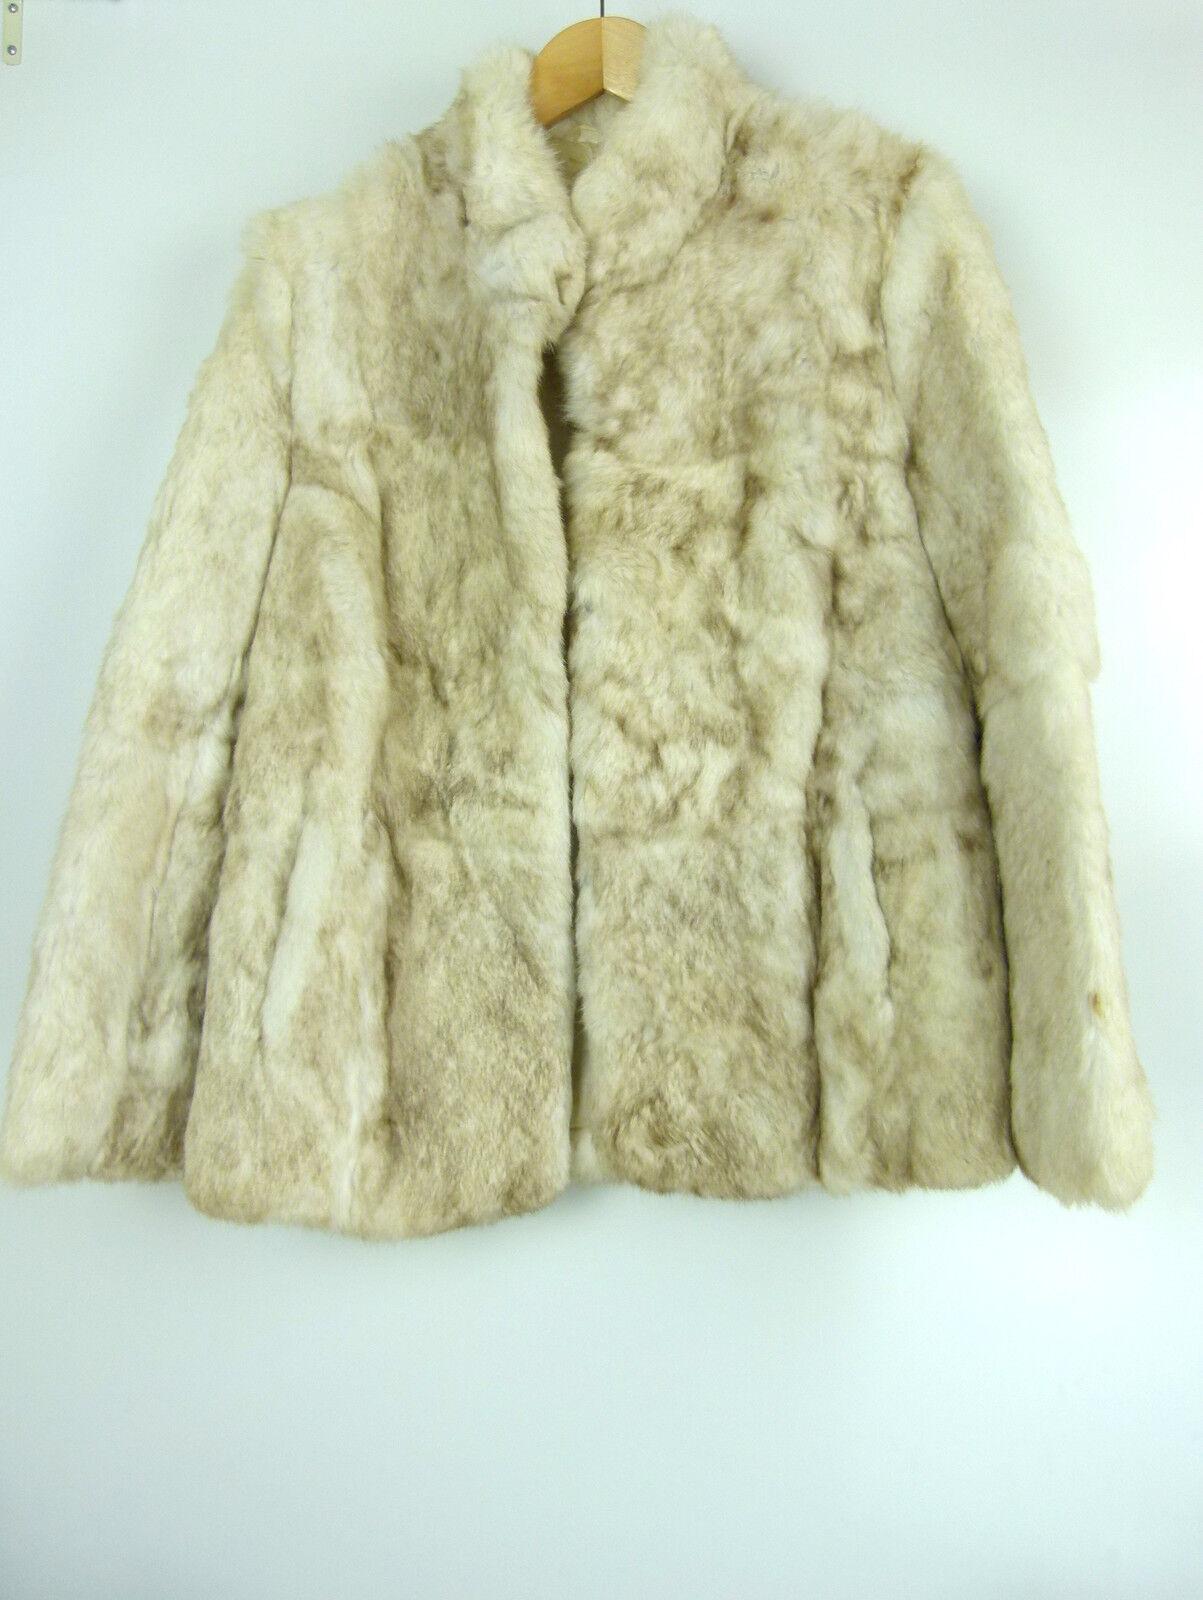 VINTAGE Fur coat Sz 12 Cream w brown tinge